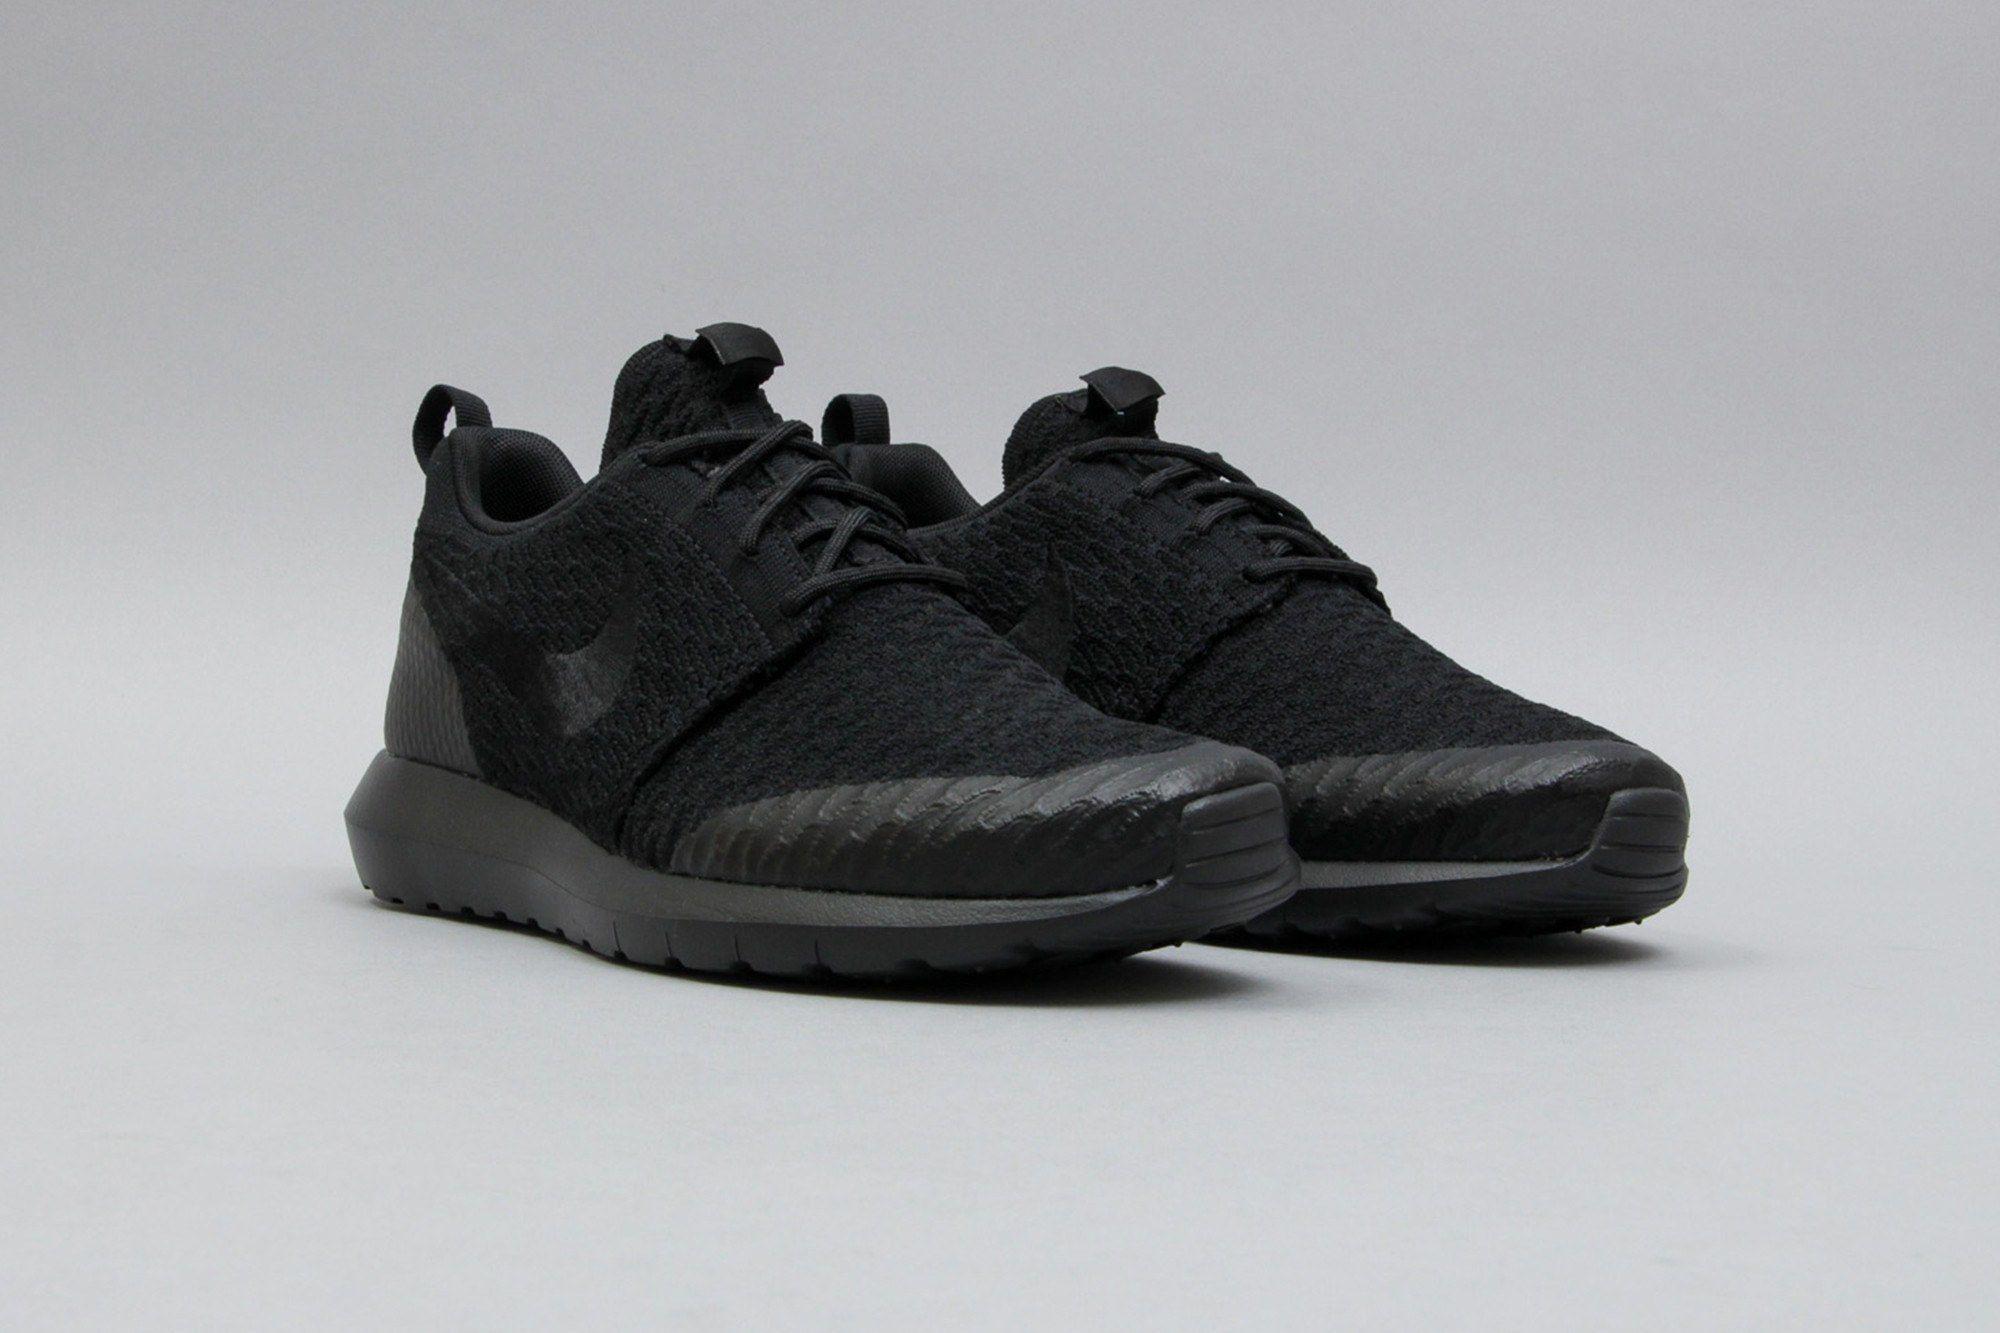 Nike Roshe One NM Flyknit SE Black Black 816531-001 (Schwarz) from B V D S T f30f9c6b18